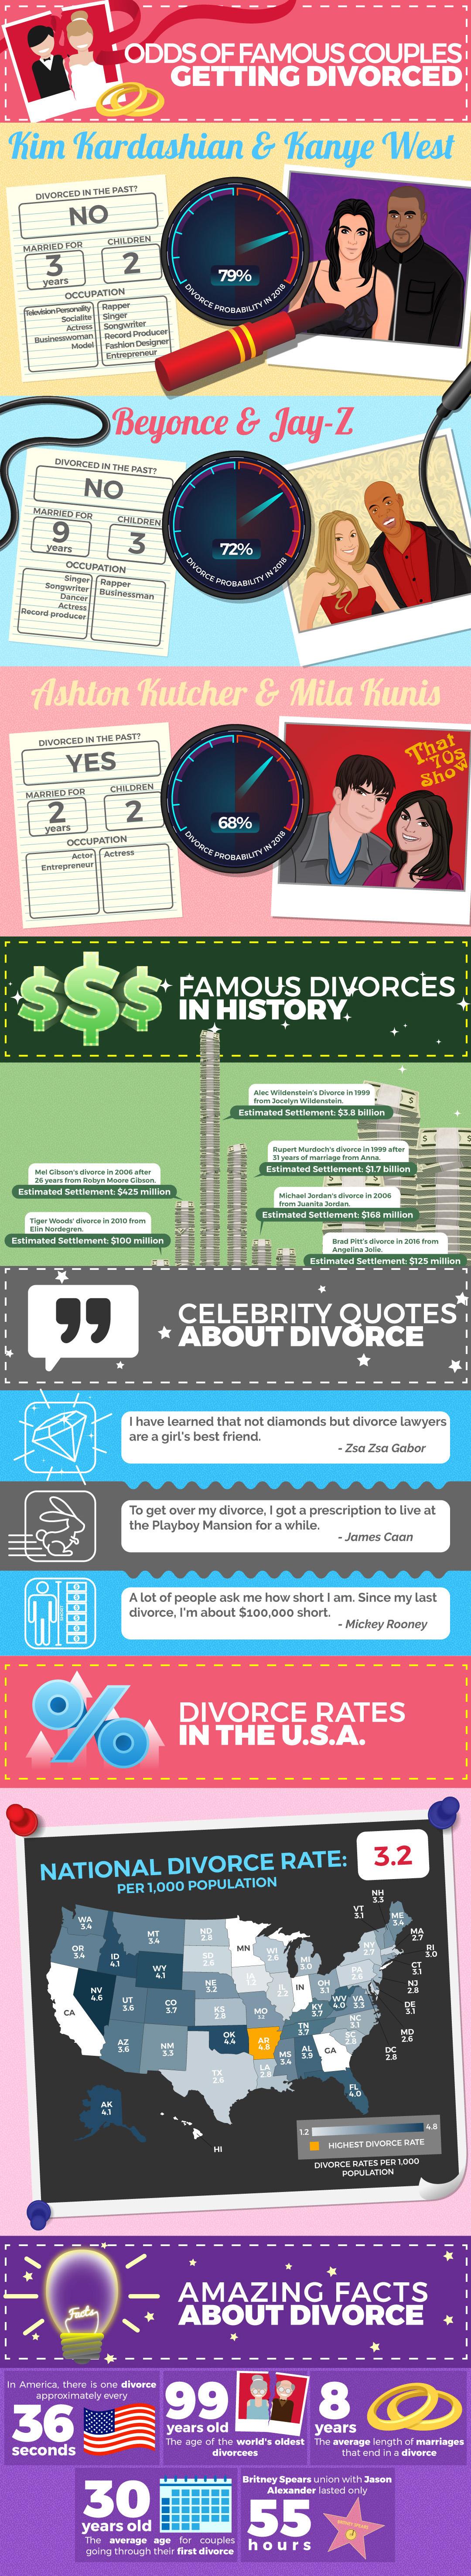 celebrity divorces infographic